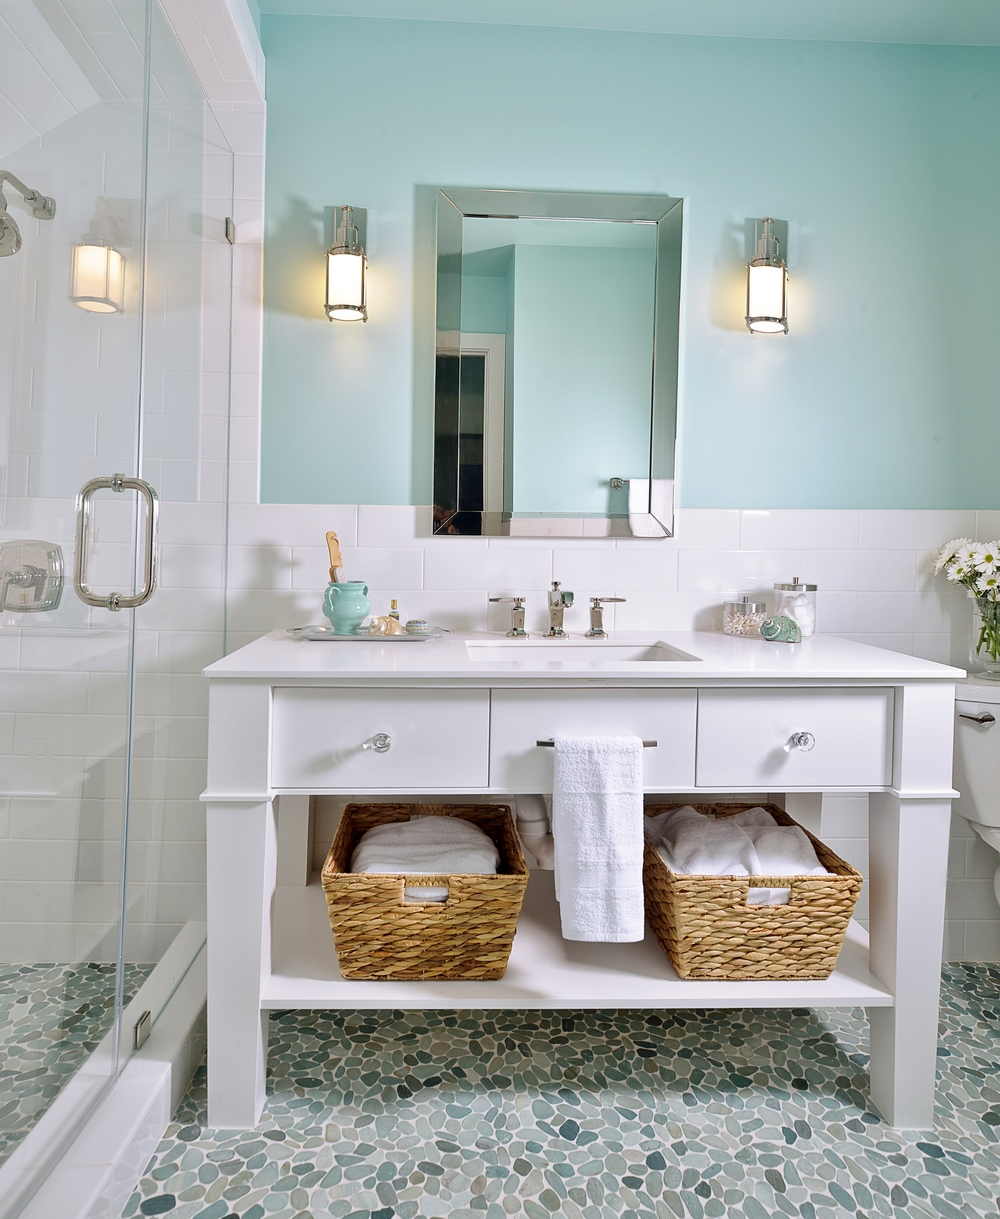 Sconces work well with the mirrored medicine cabinet in this feminine bathroom. Carla Aston, Designer #bathlight #vanitylight #wallsconce